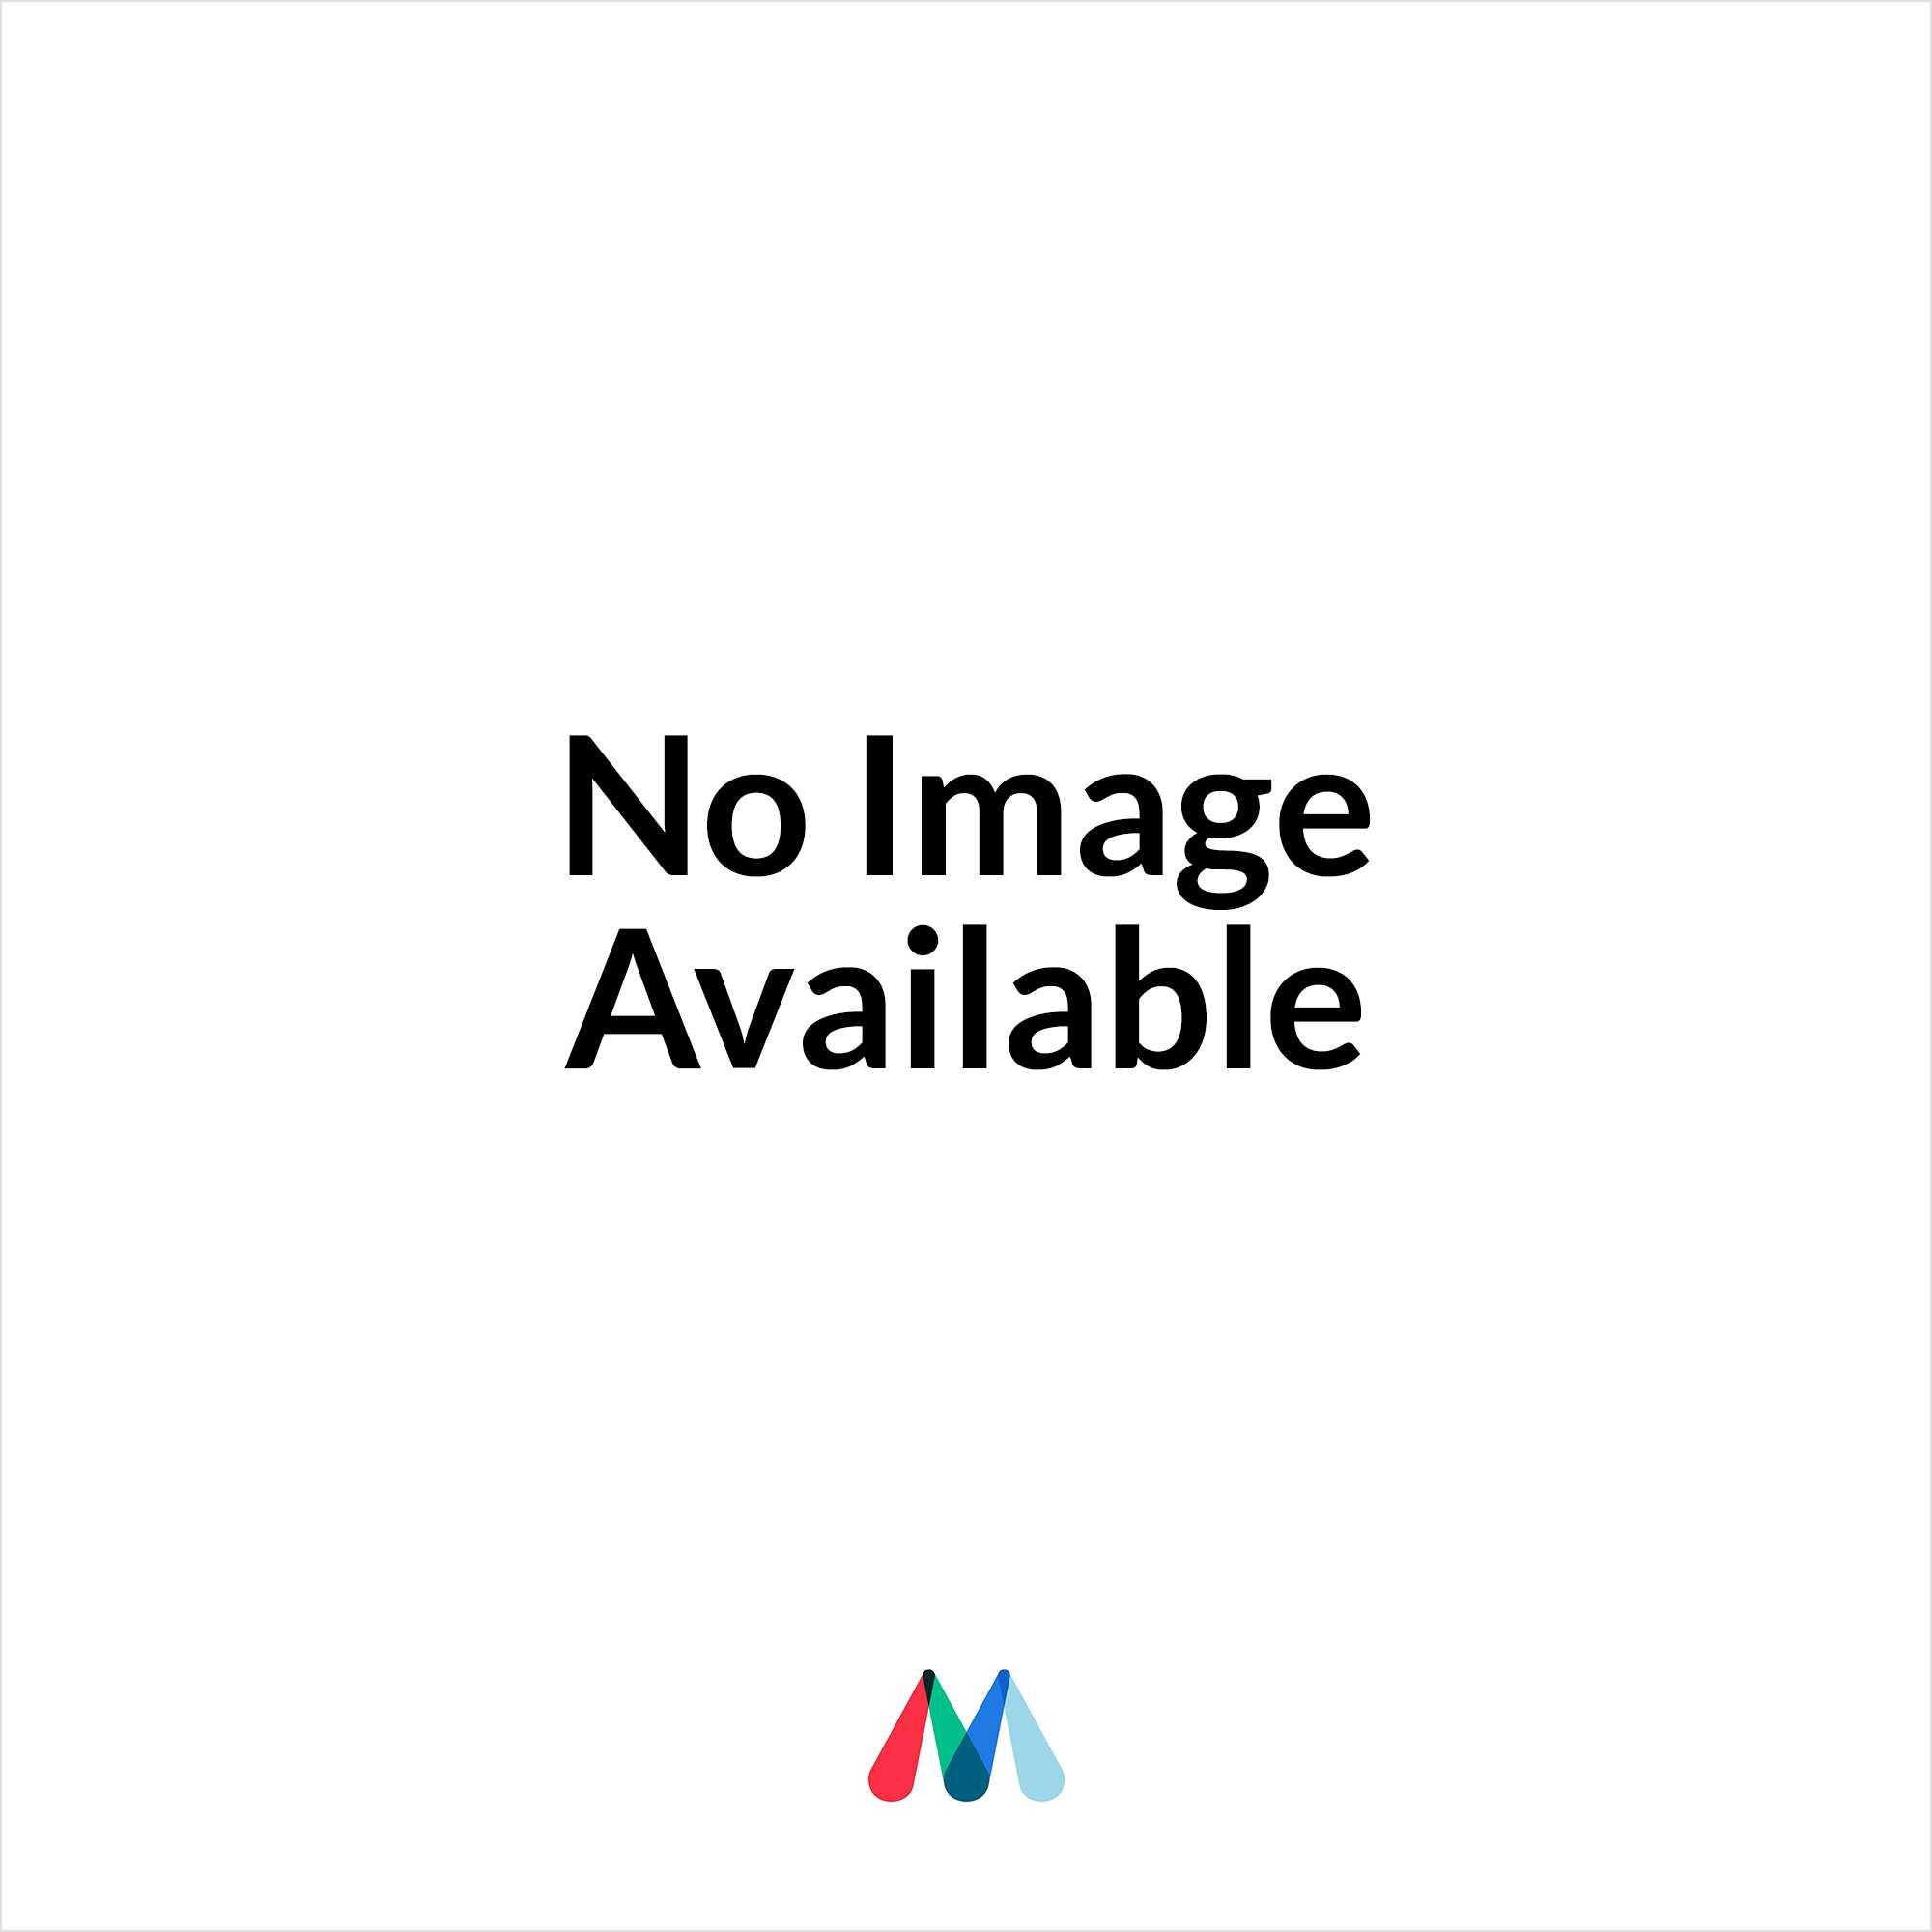 collingwood lighting collingwood lighting h2 lite t dimmable fire rh moonlightdesign co uk LED Wiring Circuit Diagram LED Light Fixture Wiring Diagram